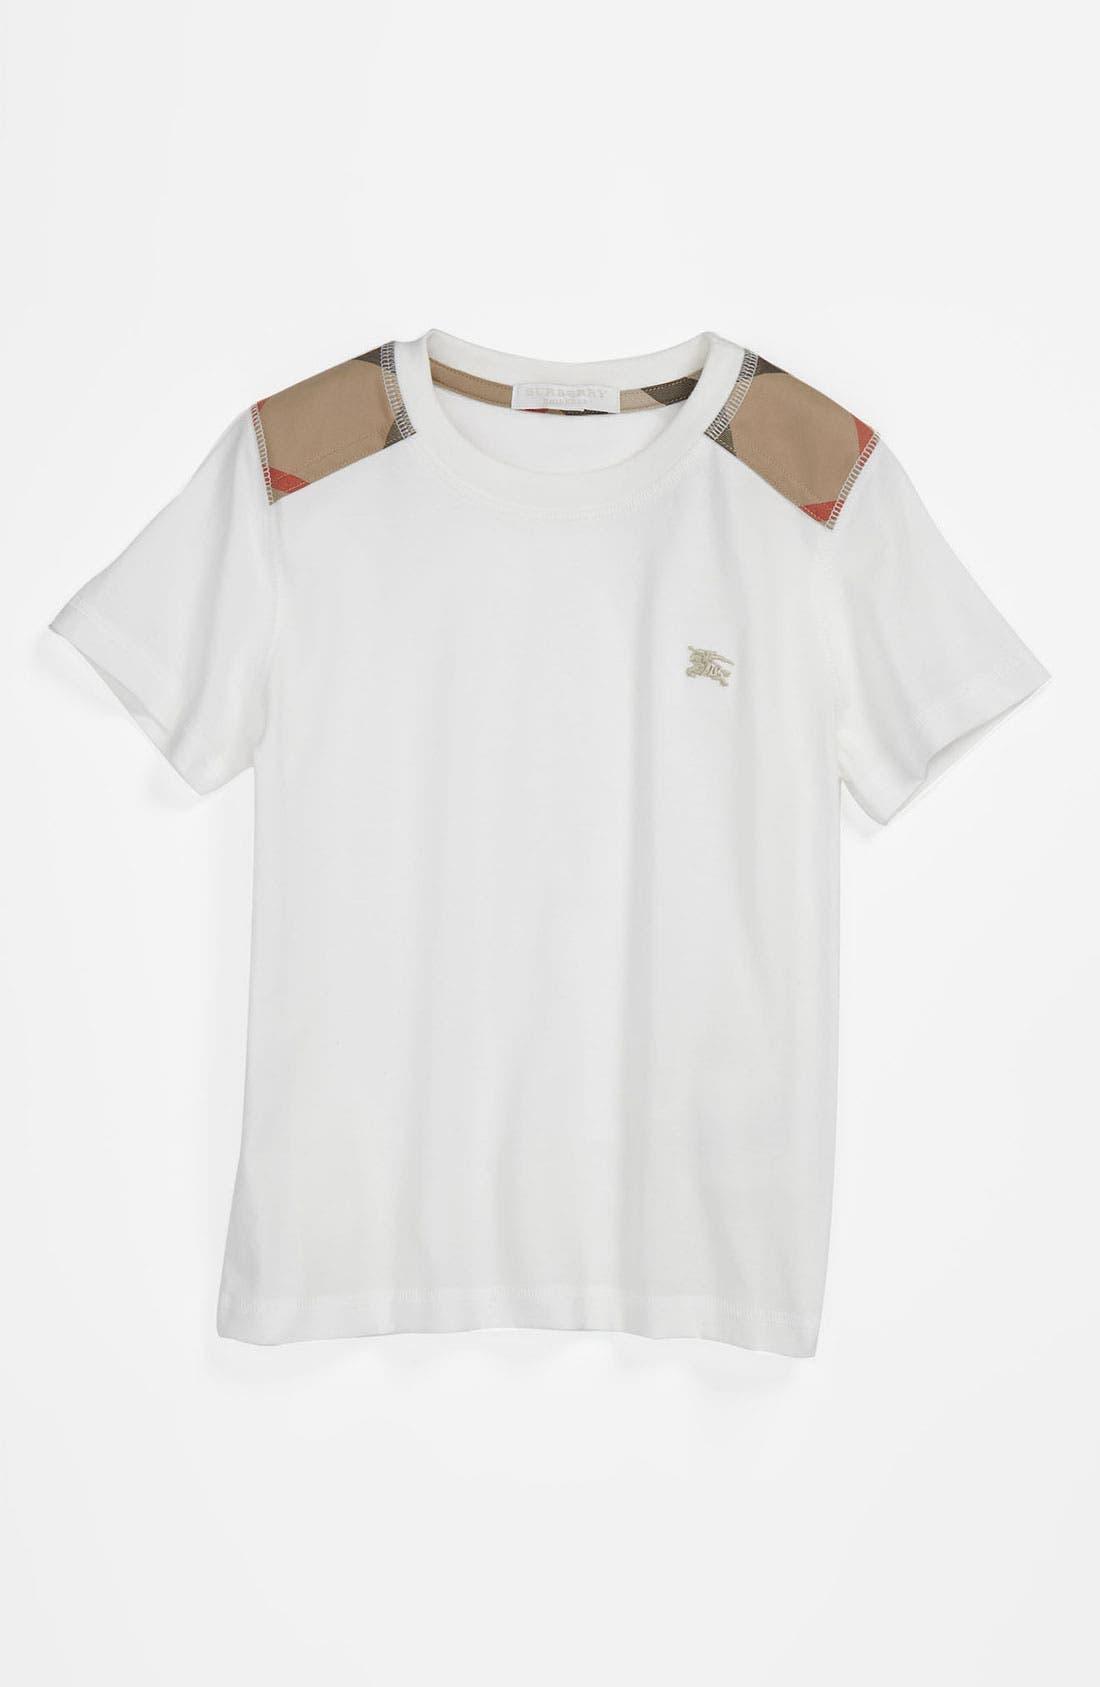 Alternate Image 1 Selected - Burberry Shoulder Check T-Shirt (Little Boys & Big Boys)